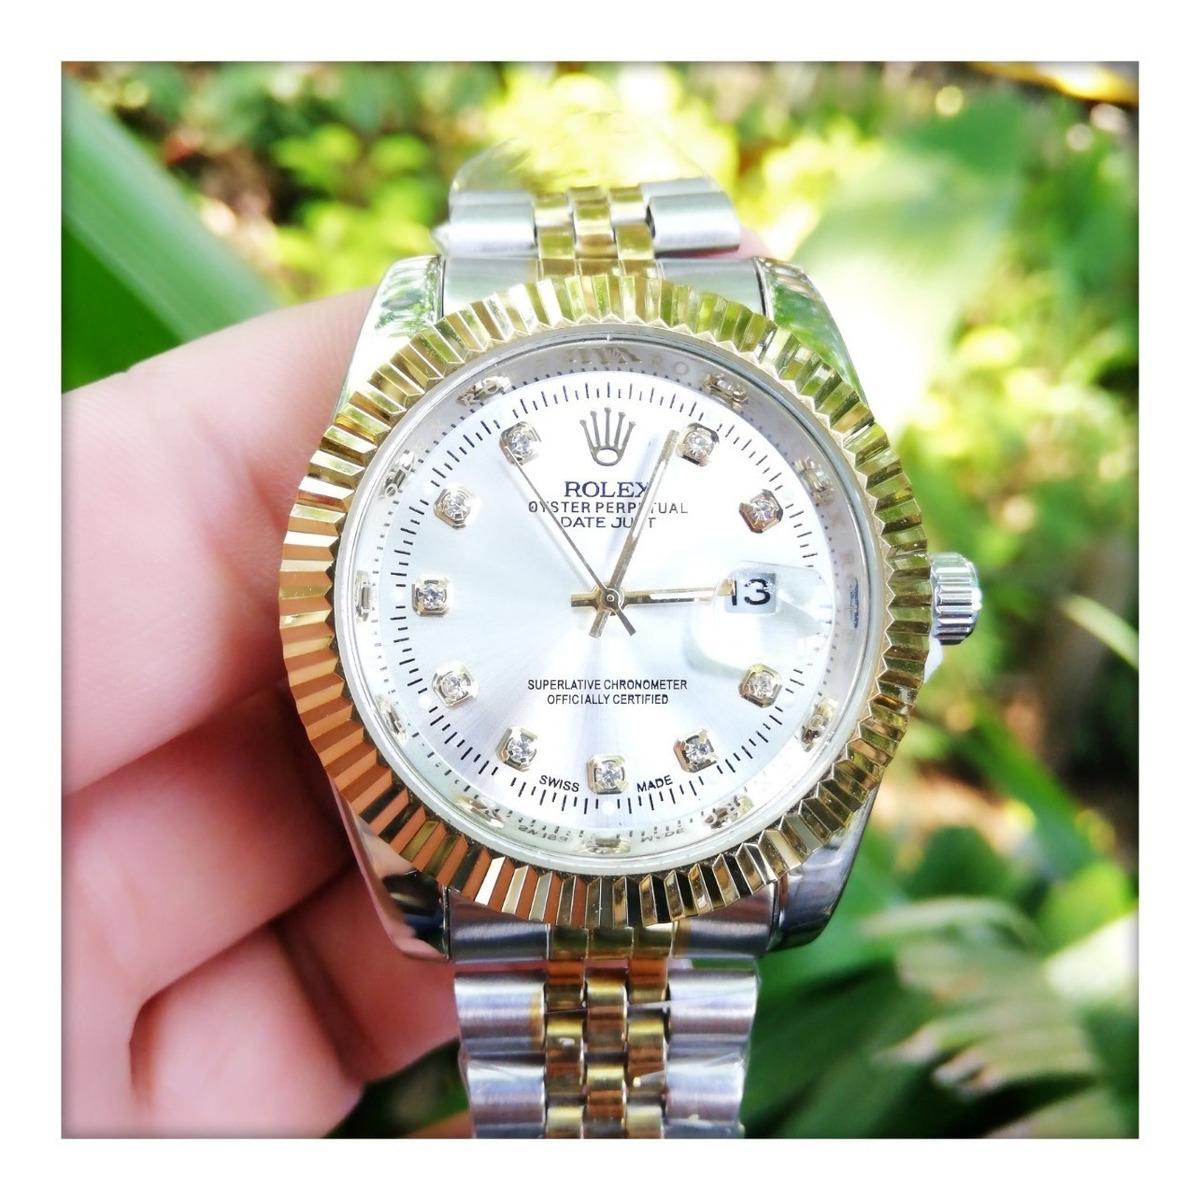 Bicolor Diamantes Con Unisex Reloj Rolex RjL54A